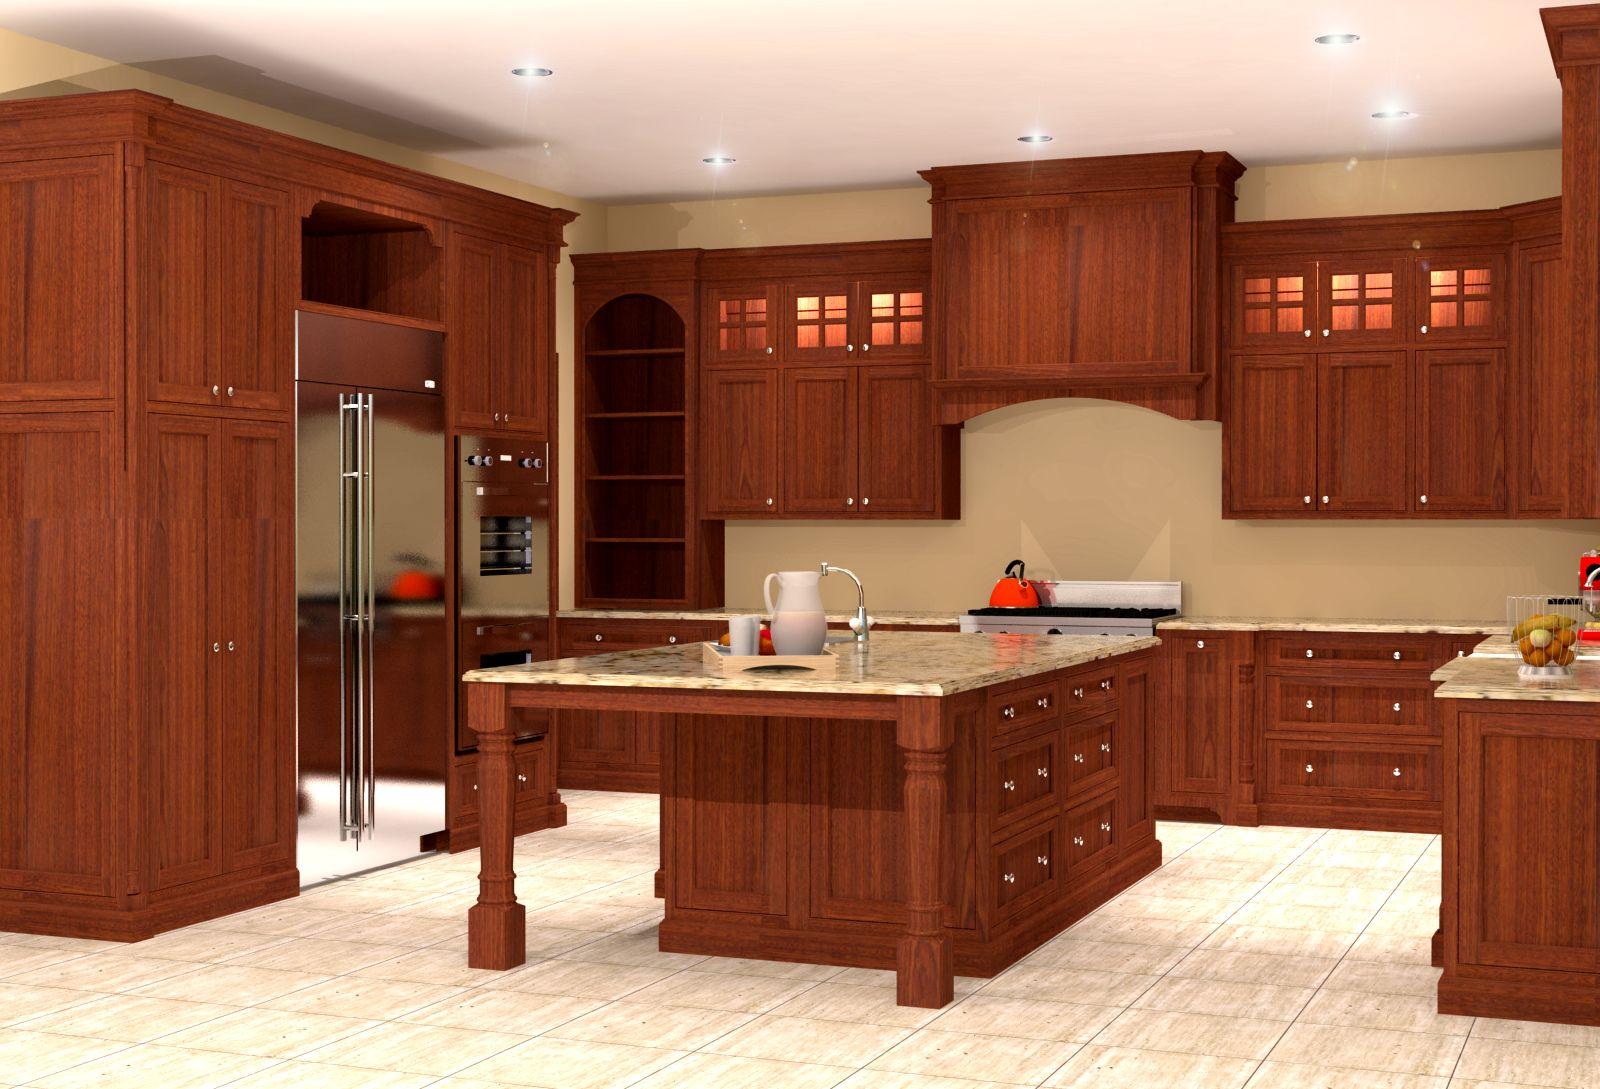 Inset mahogany kitchen design rendering nick miller design for 9x12 kitchen ideas